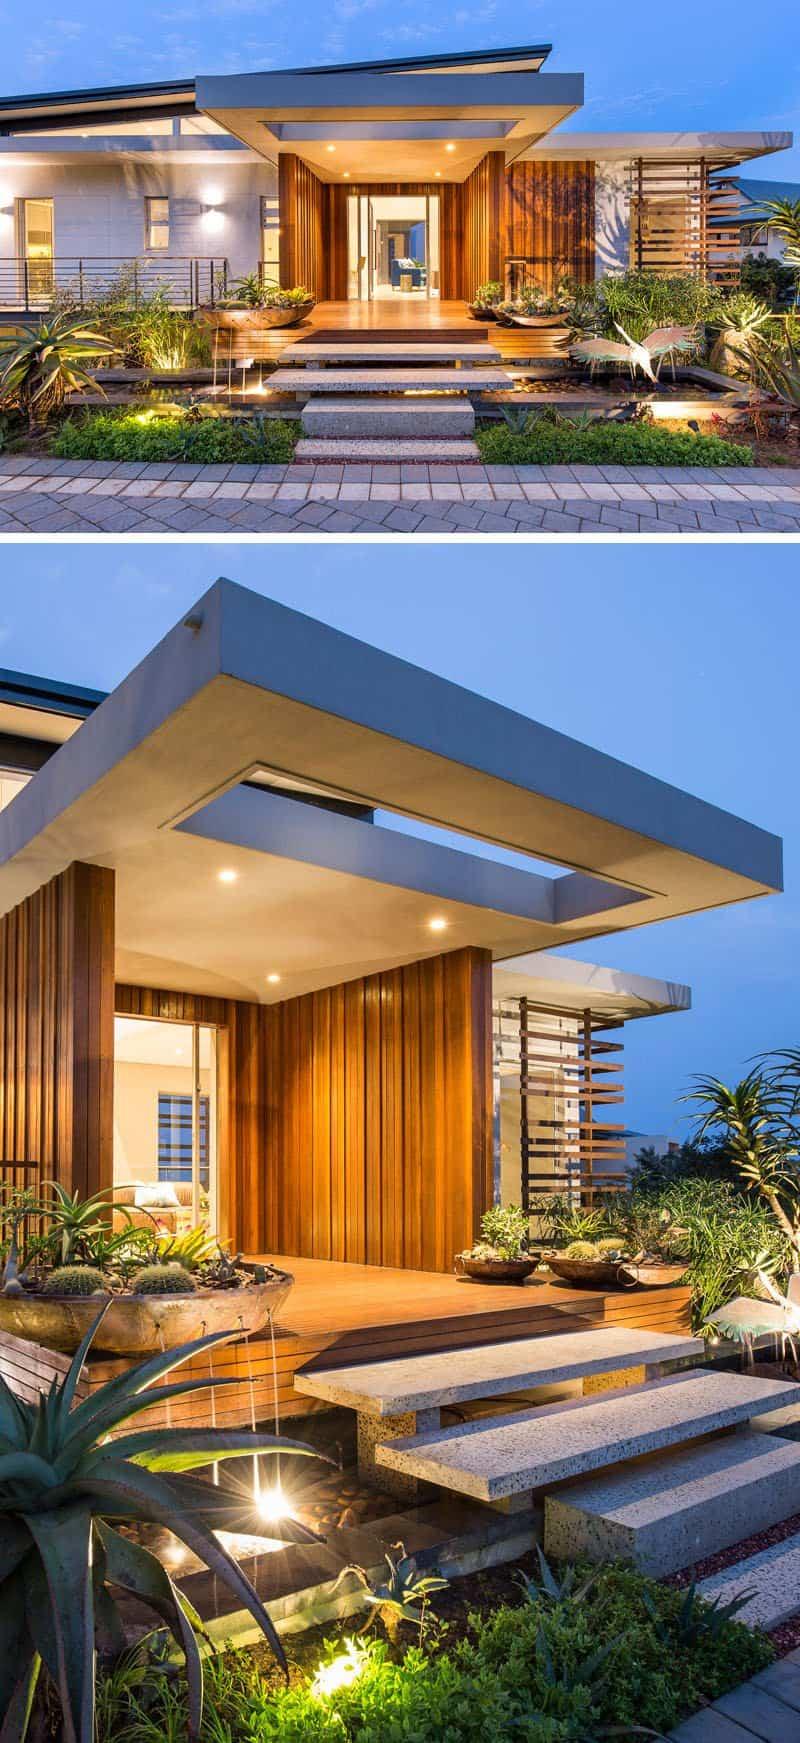 casa moderna alrededor de una piscina cubierta 2